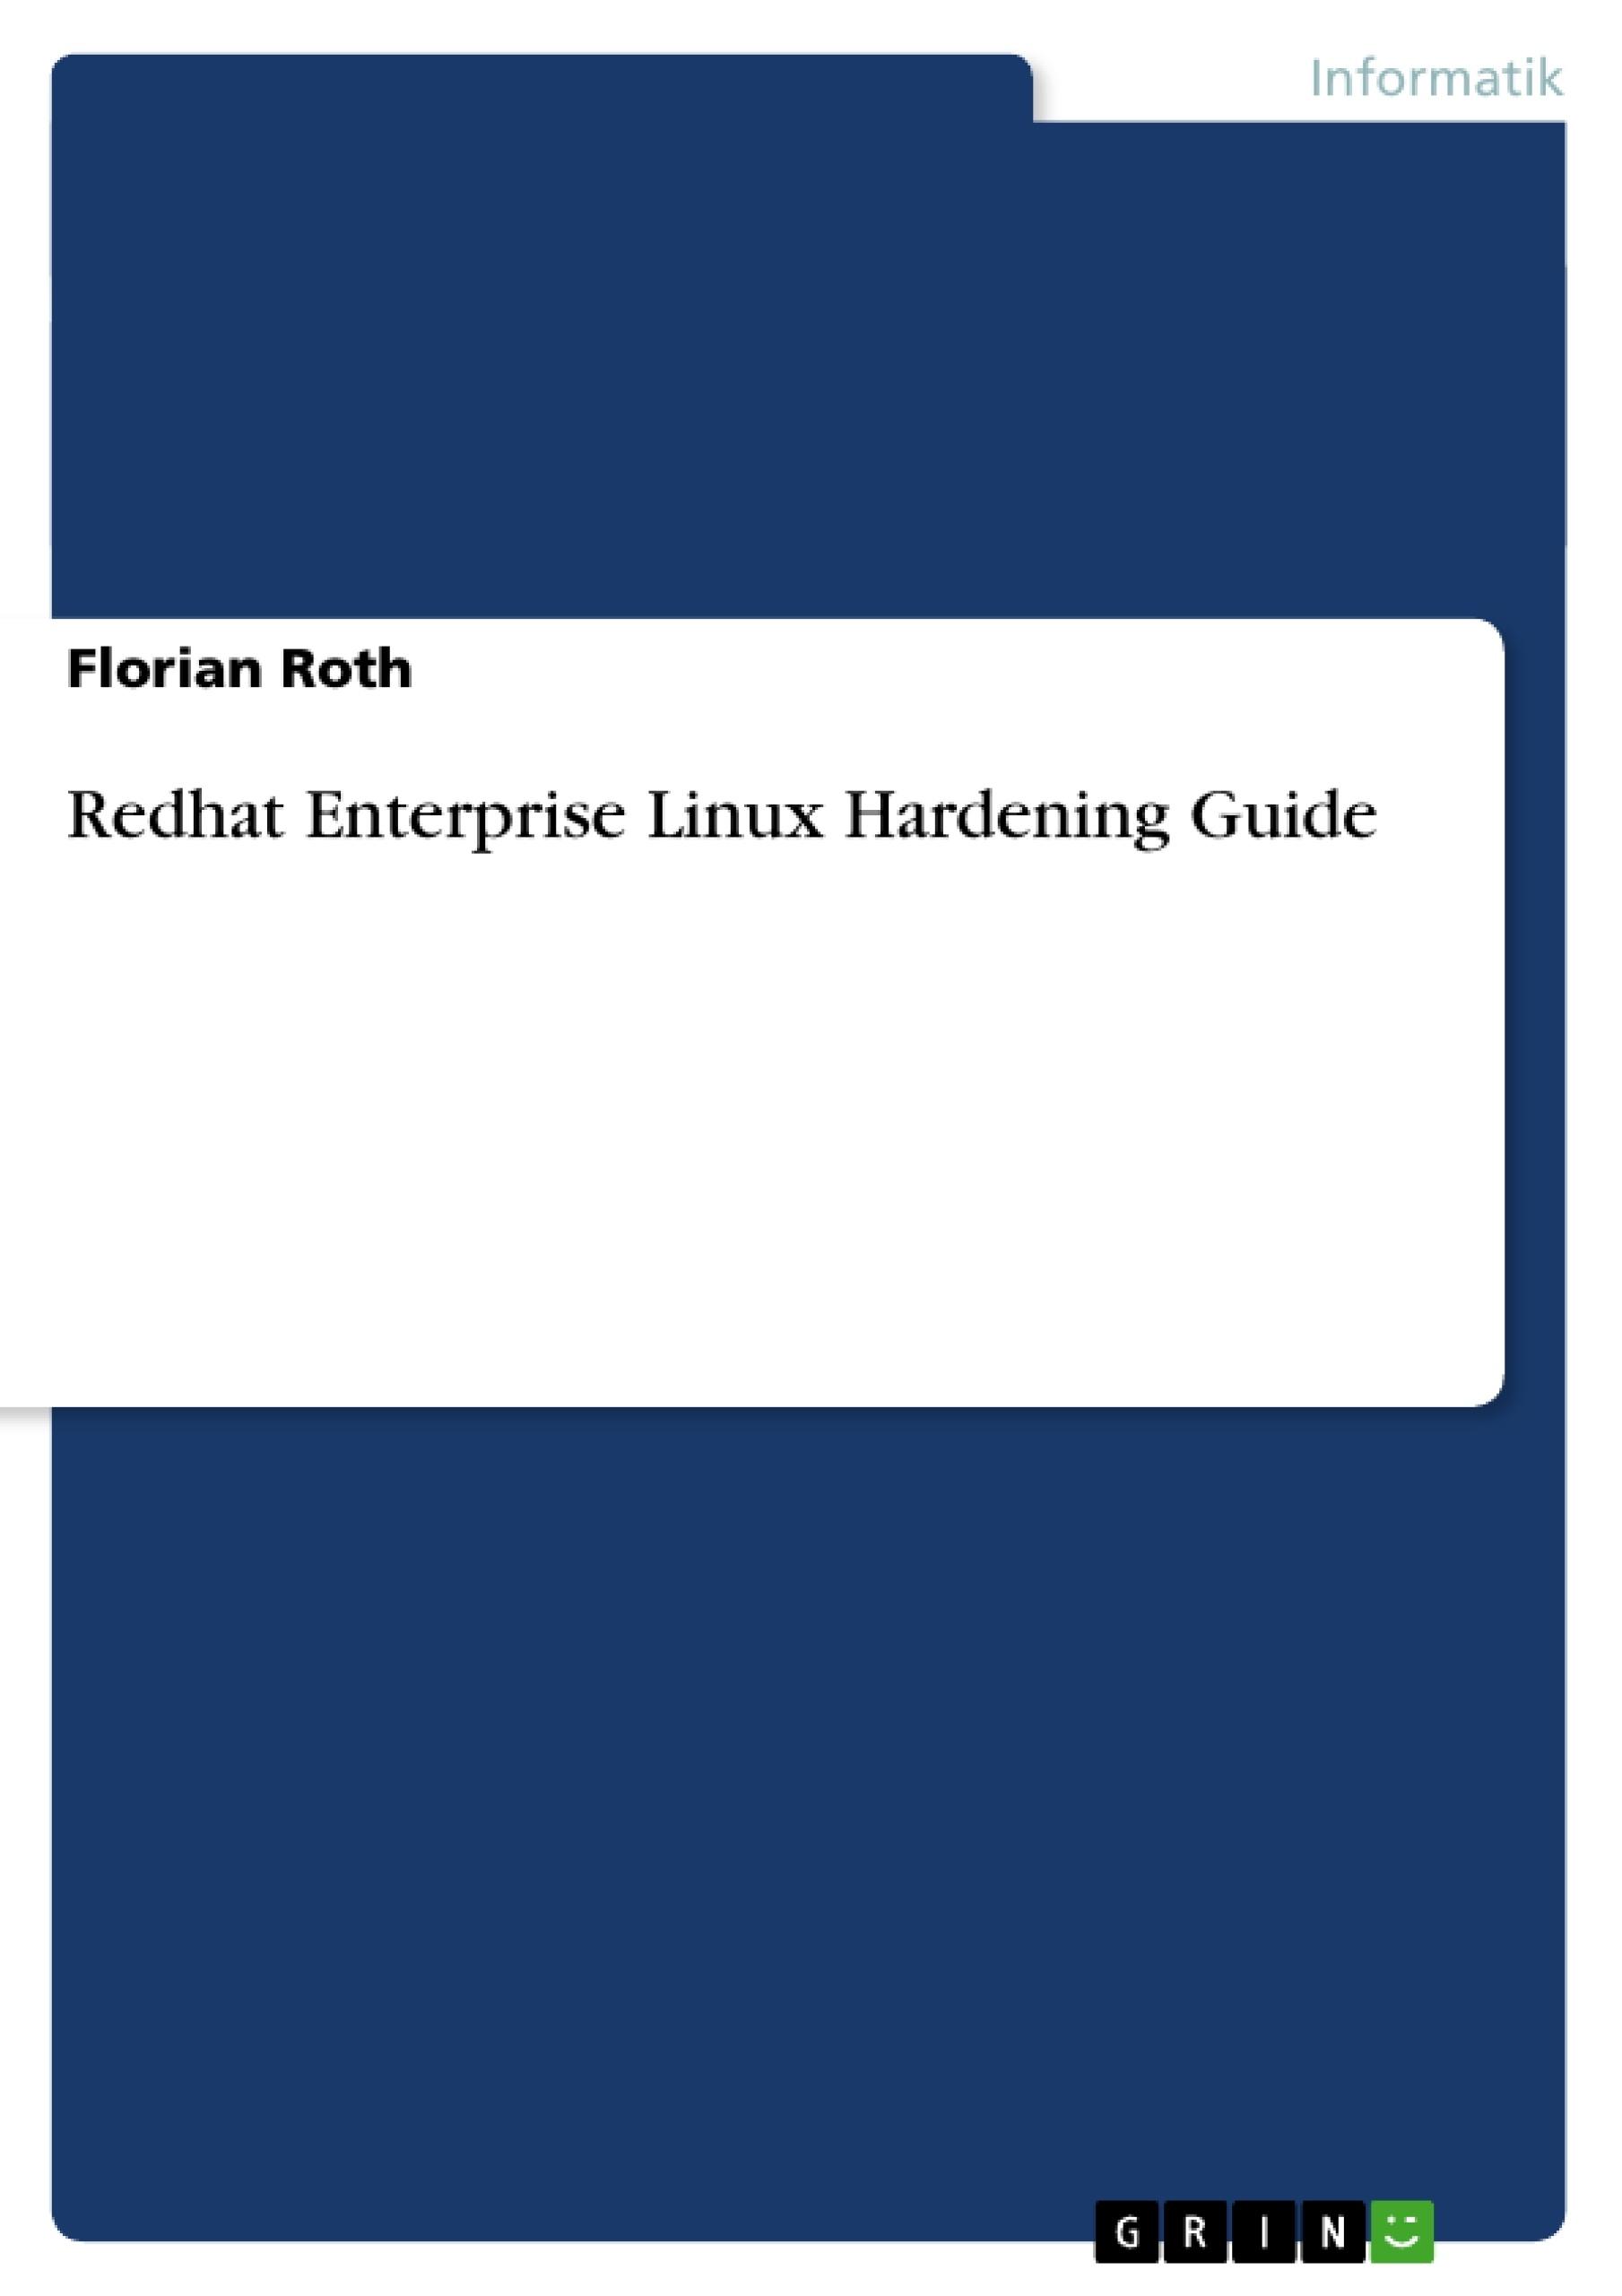 Titel: Redhat Enterprise Linux Hardening Guide